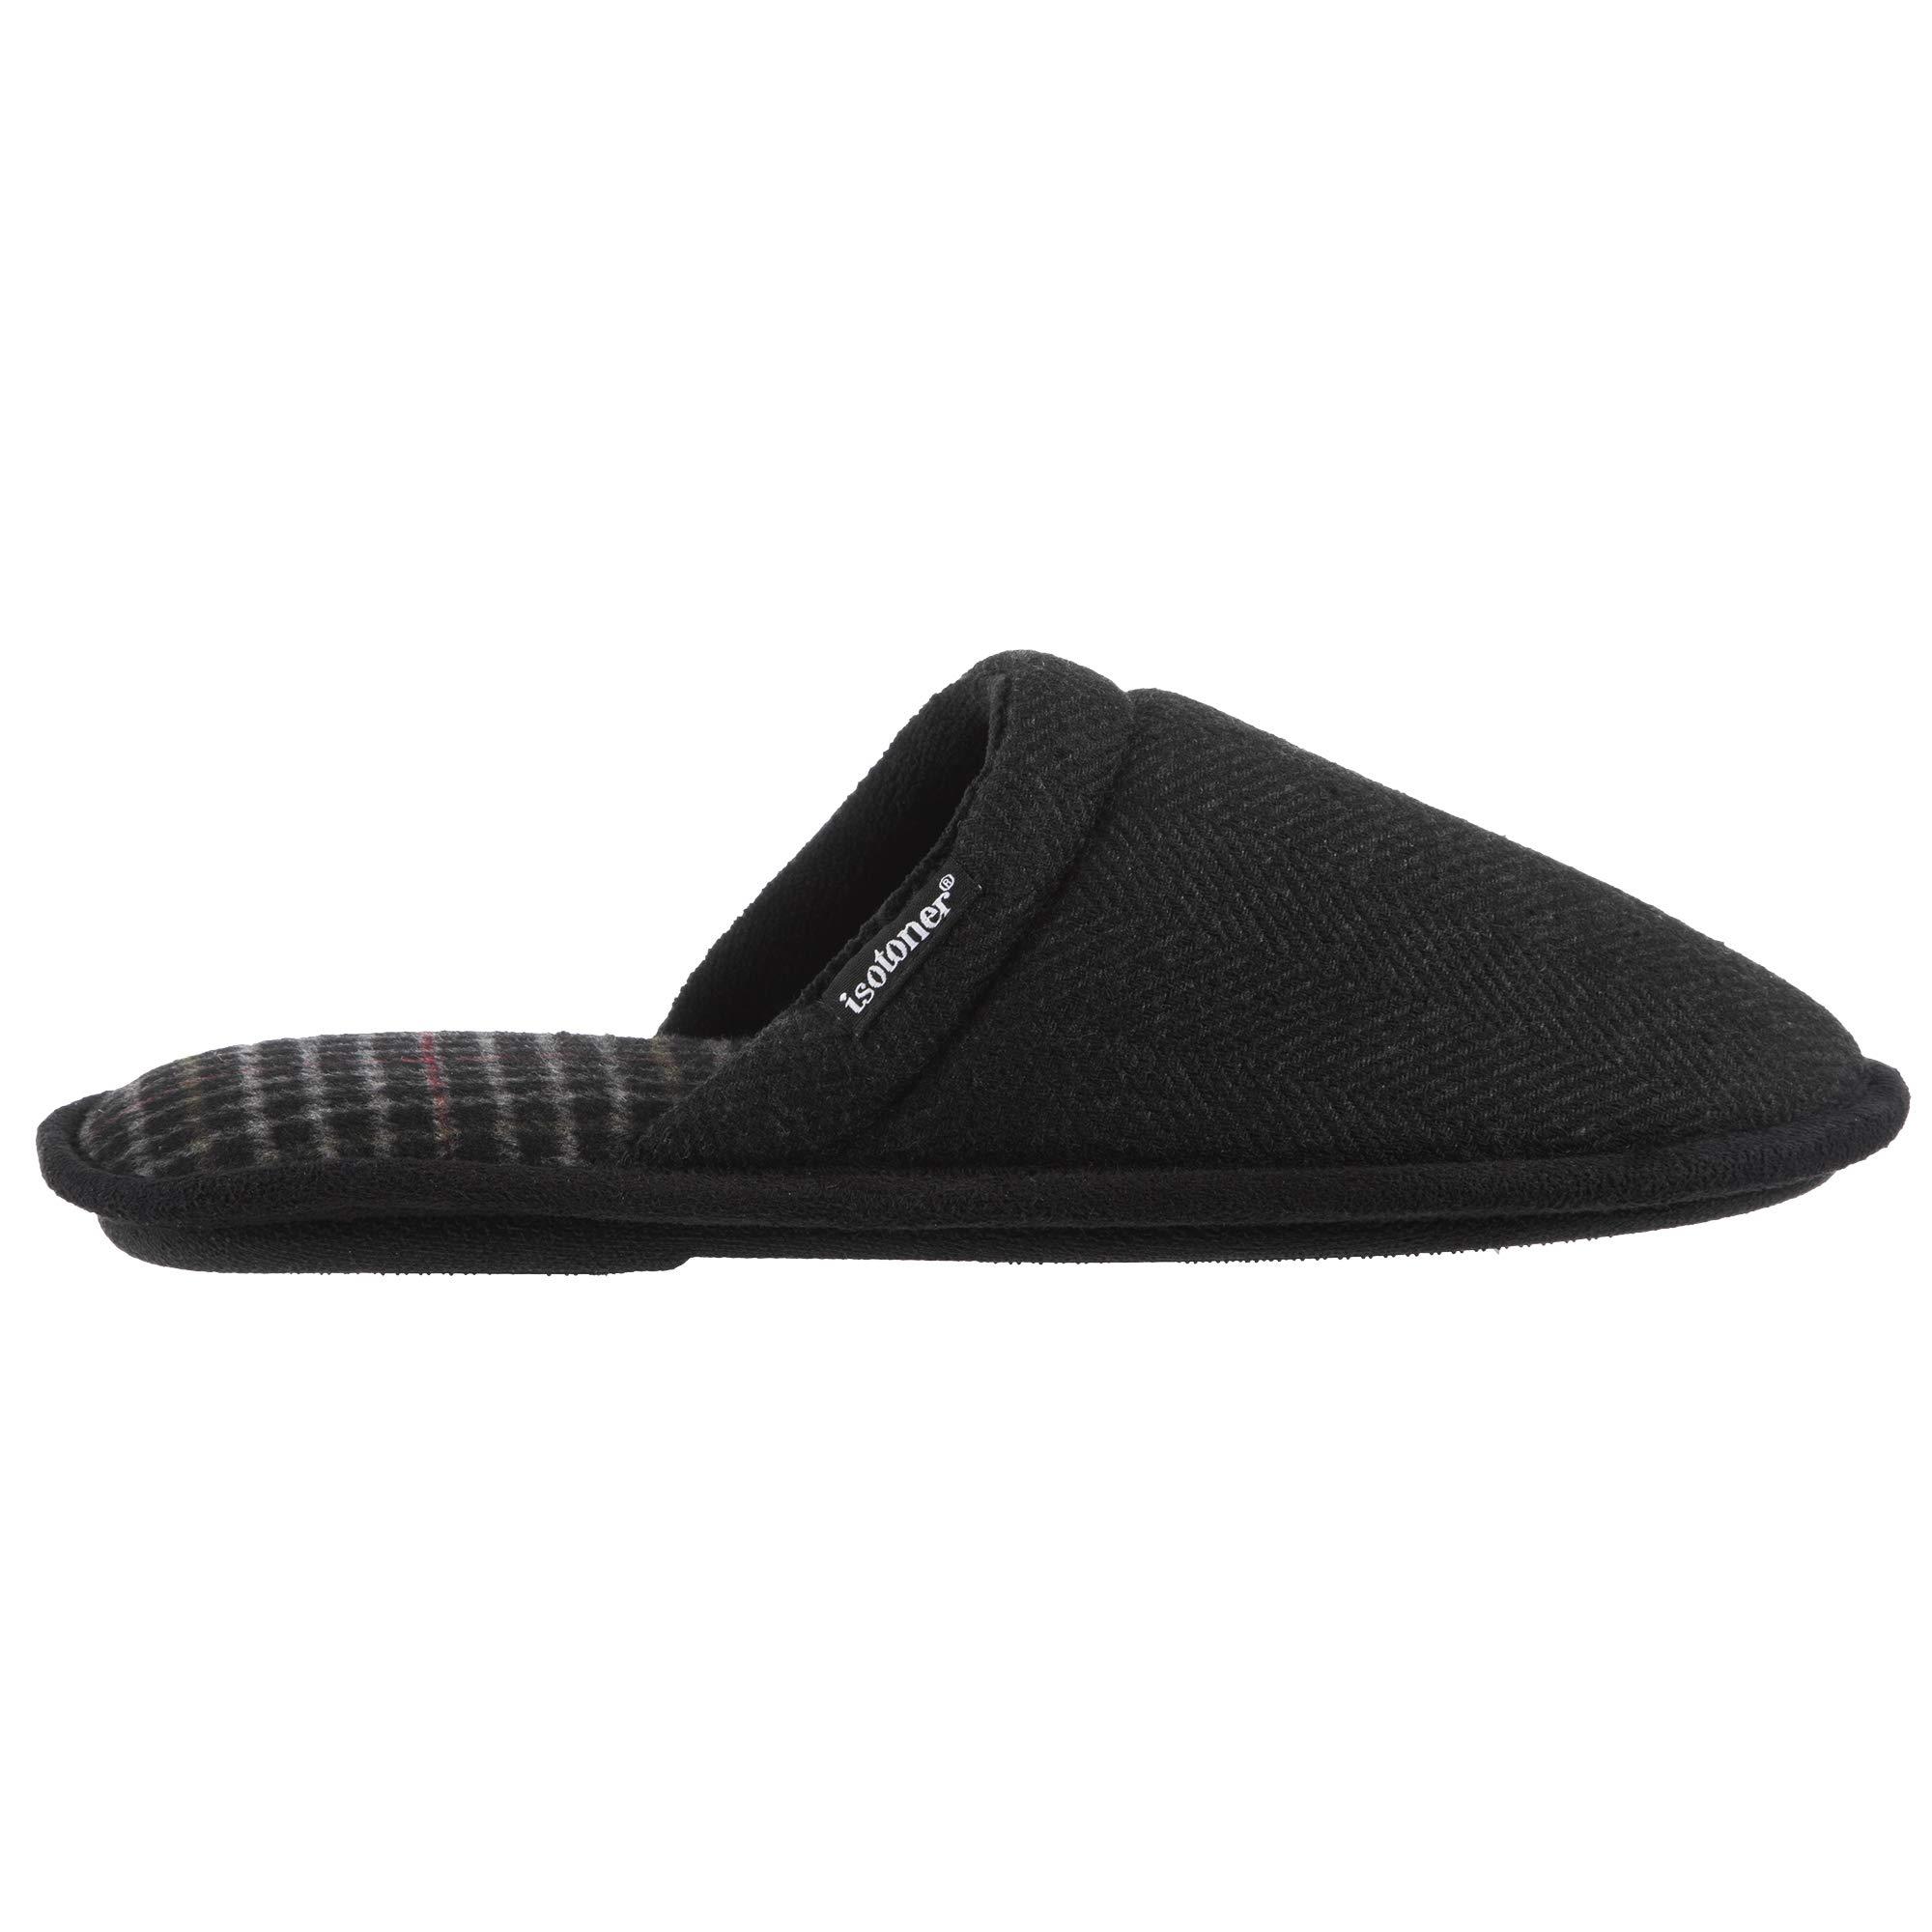 Image of Slip On Black Scuff Slippers for Men